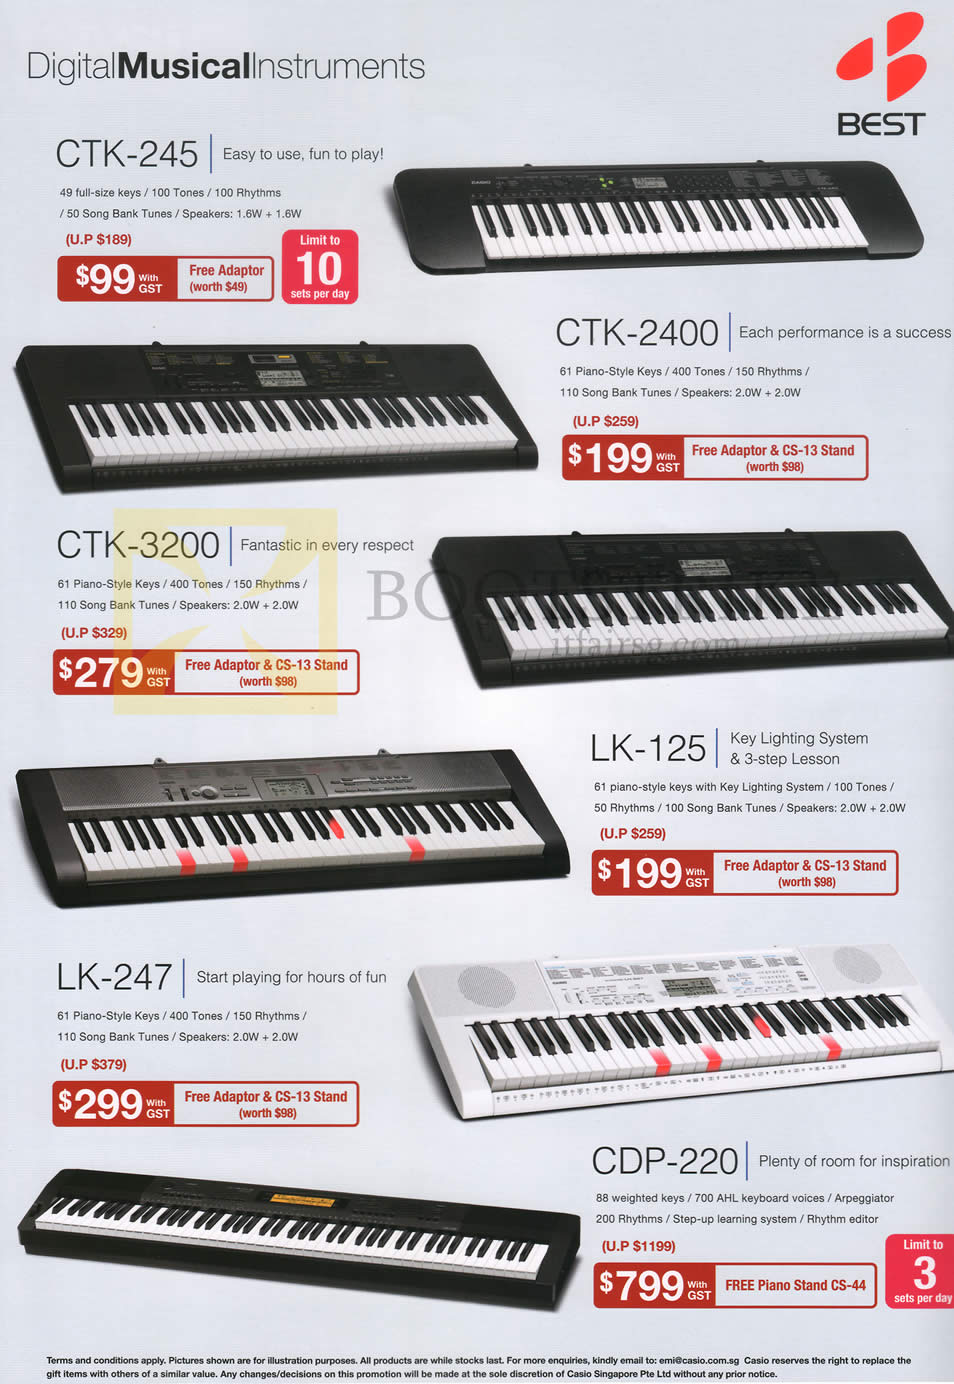 SITEX 2014 price list image brochure of Casio Music Best Denki Keyboards Pianos CTK-245, CTK-2400, CTK-3200, LK-125, LK-247, CDP-220